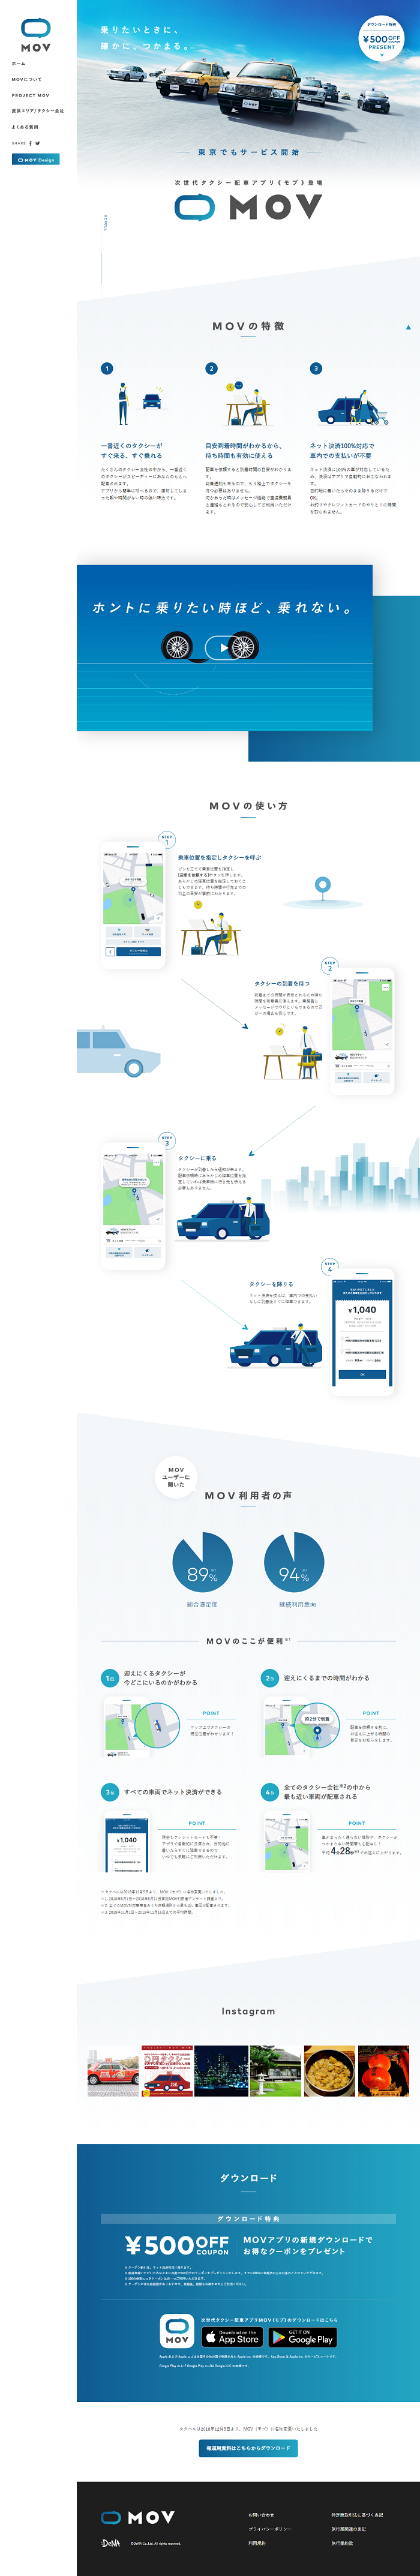 MOV│ タクシー配車アプリ